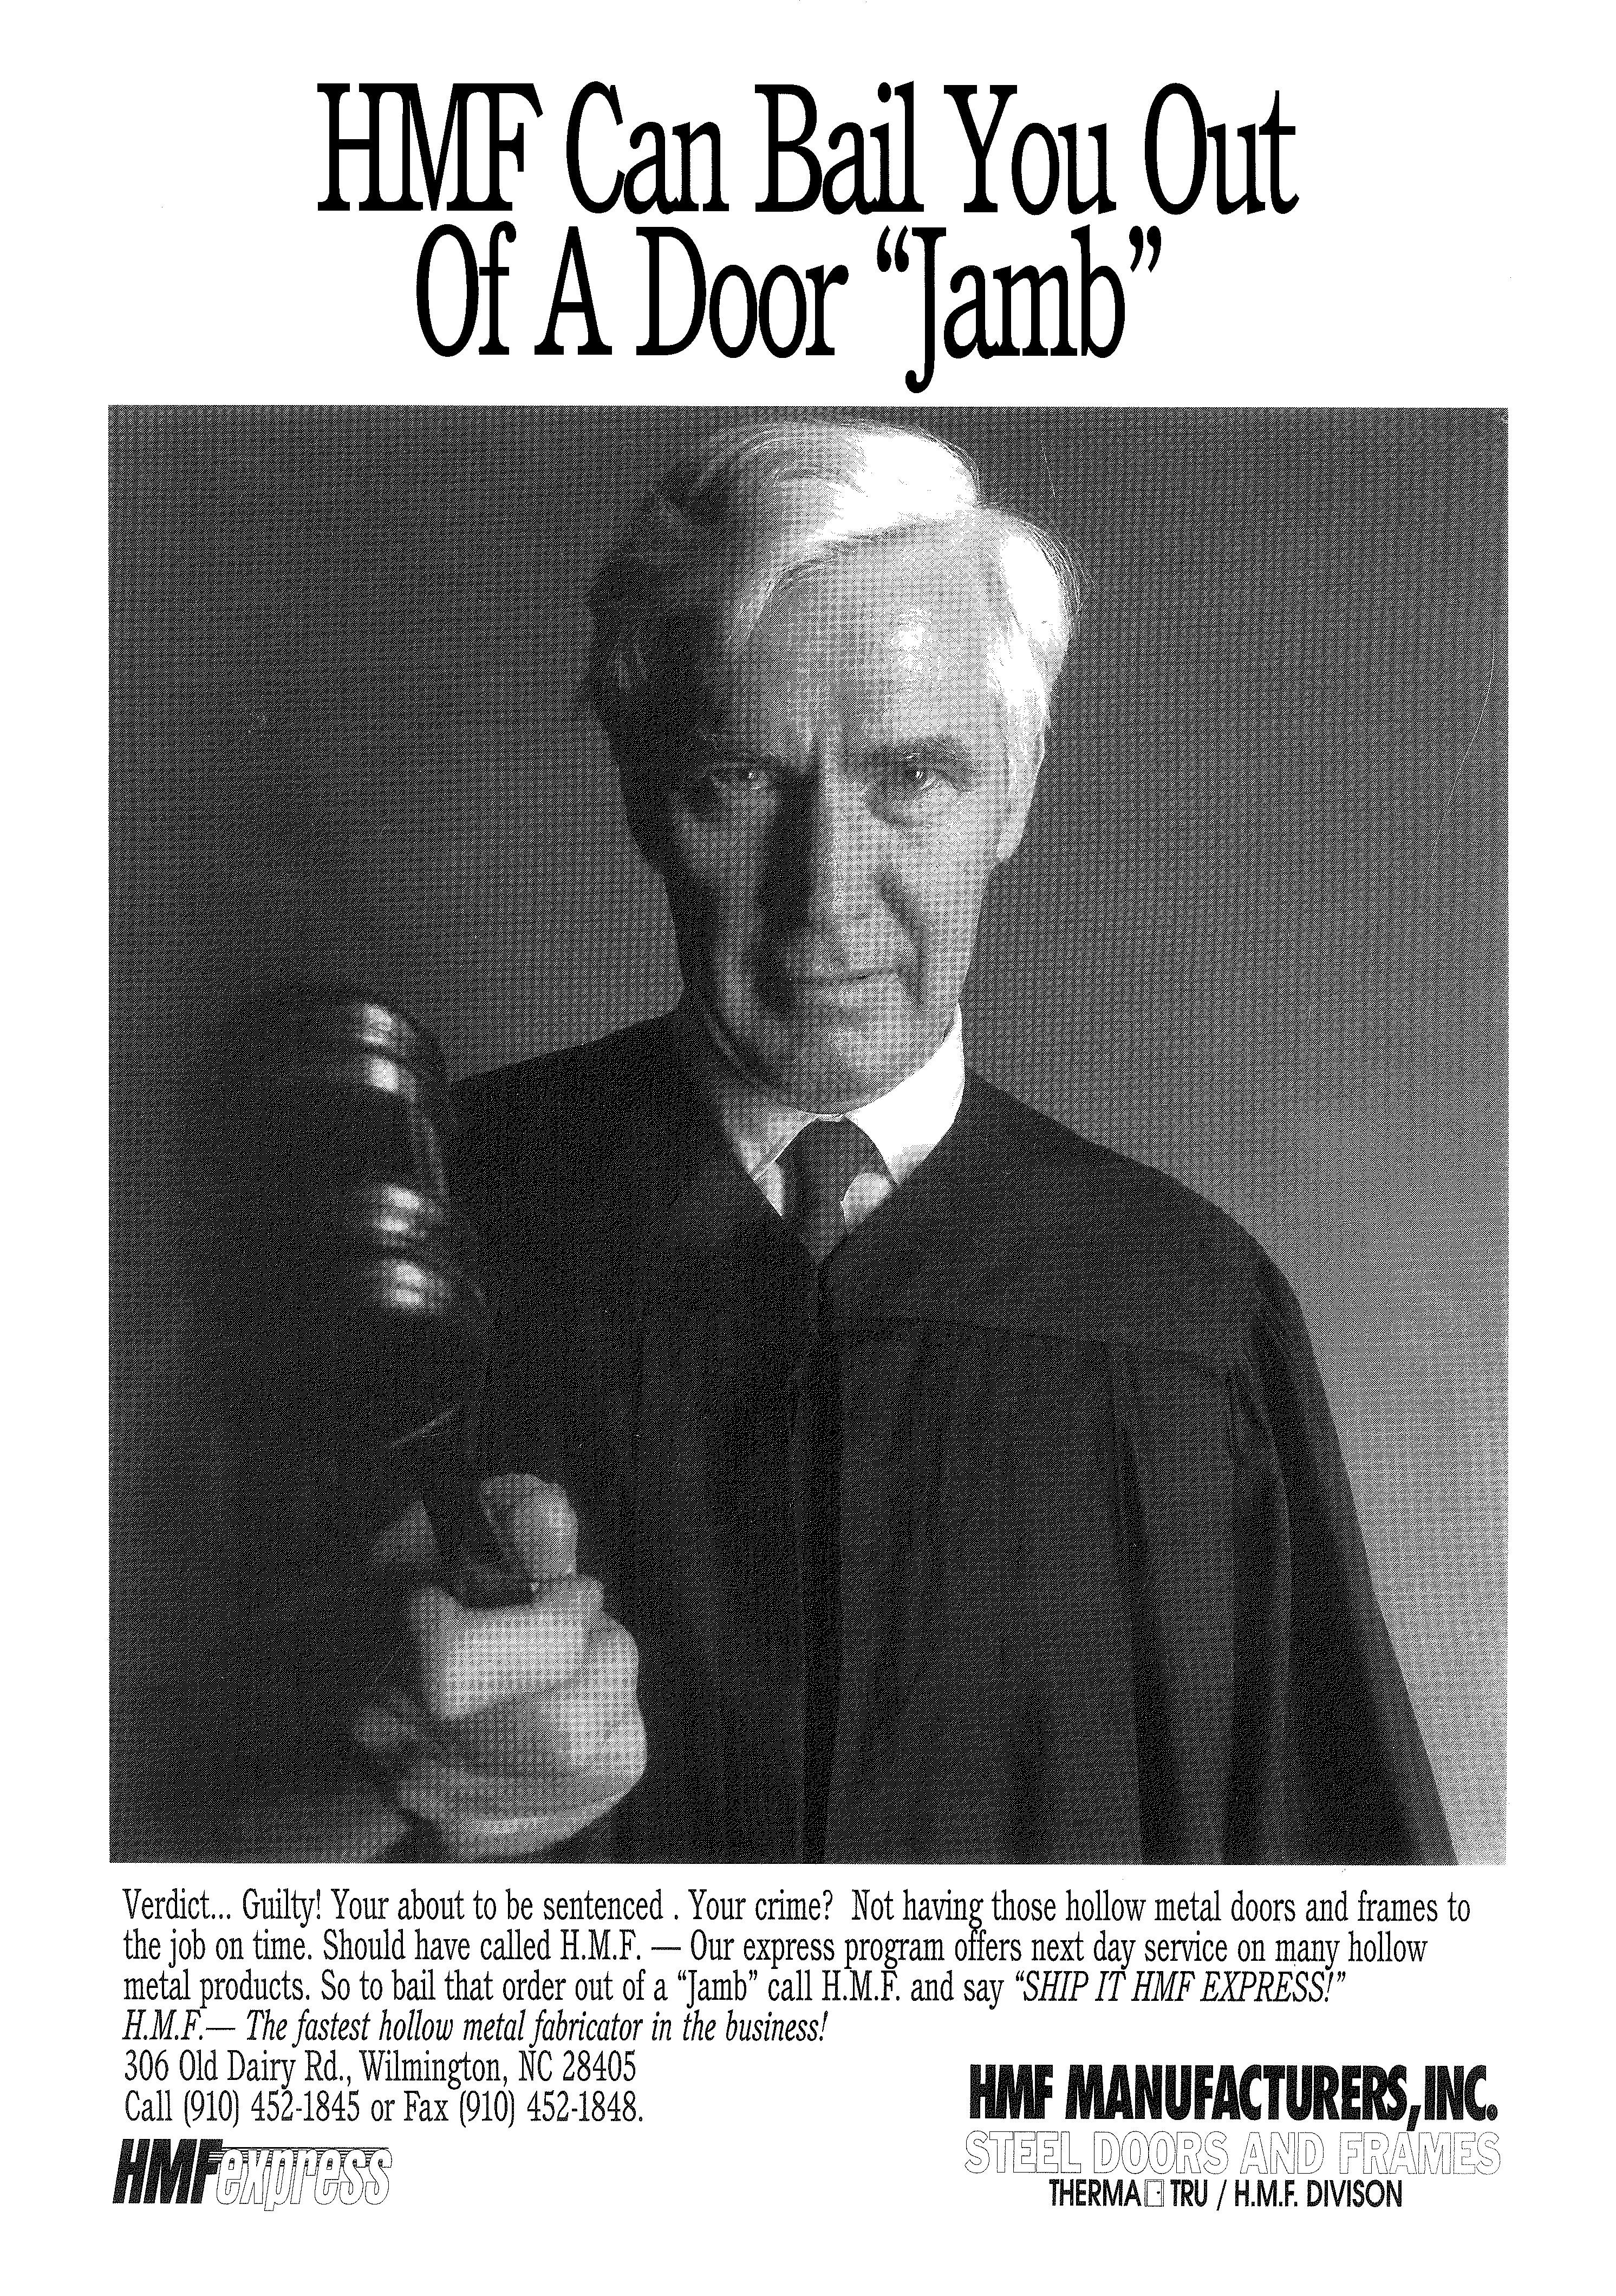 Judge Jamb